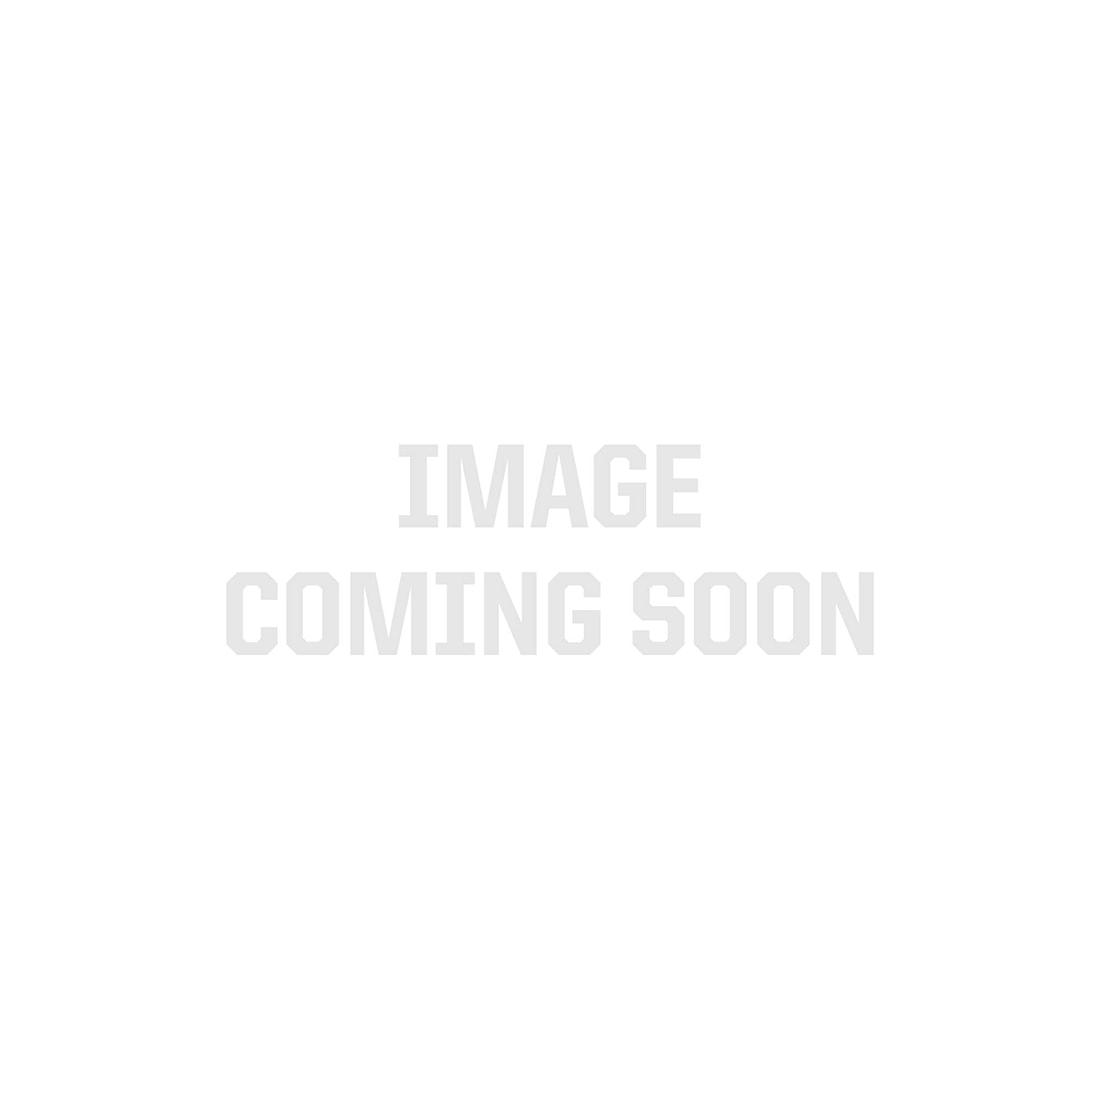 Lutron CTCL-153P Skylark Contour Dimmable CFL/LED Dimmer; 150 Watt, Single Pole or 3-Way (Multi-location) Light Almond